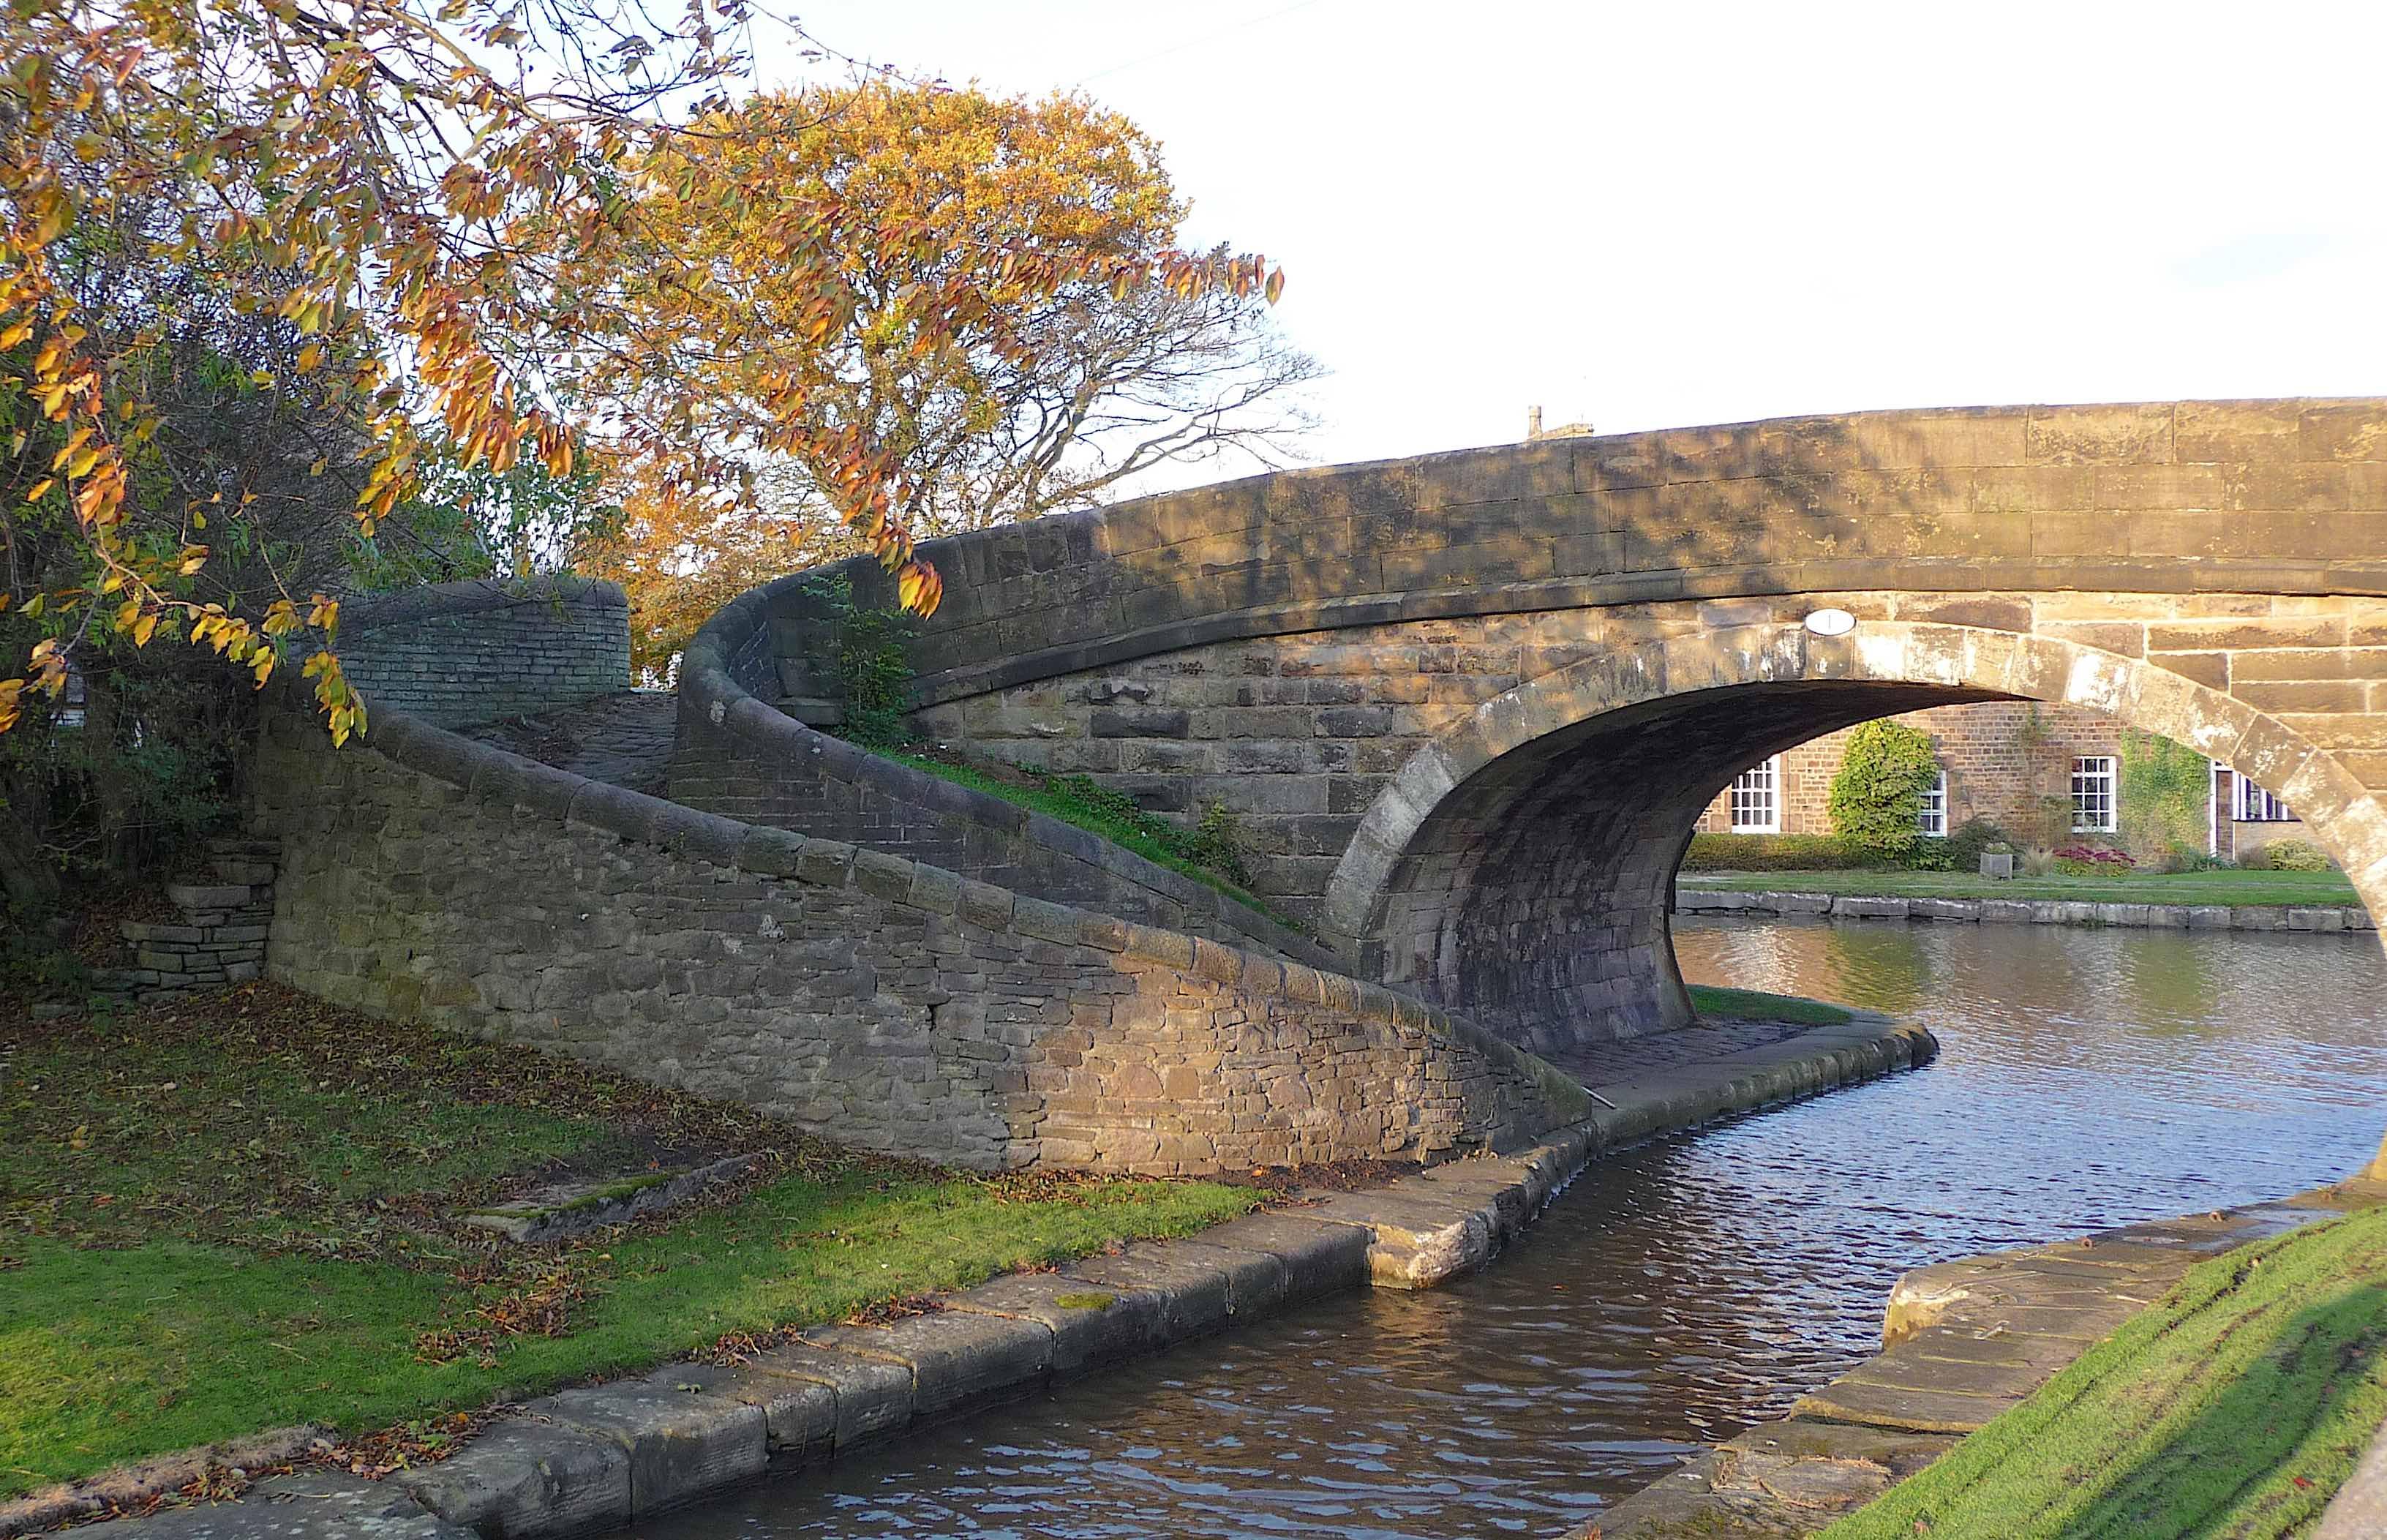 19.Top Lock Bridge